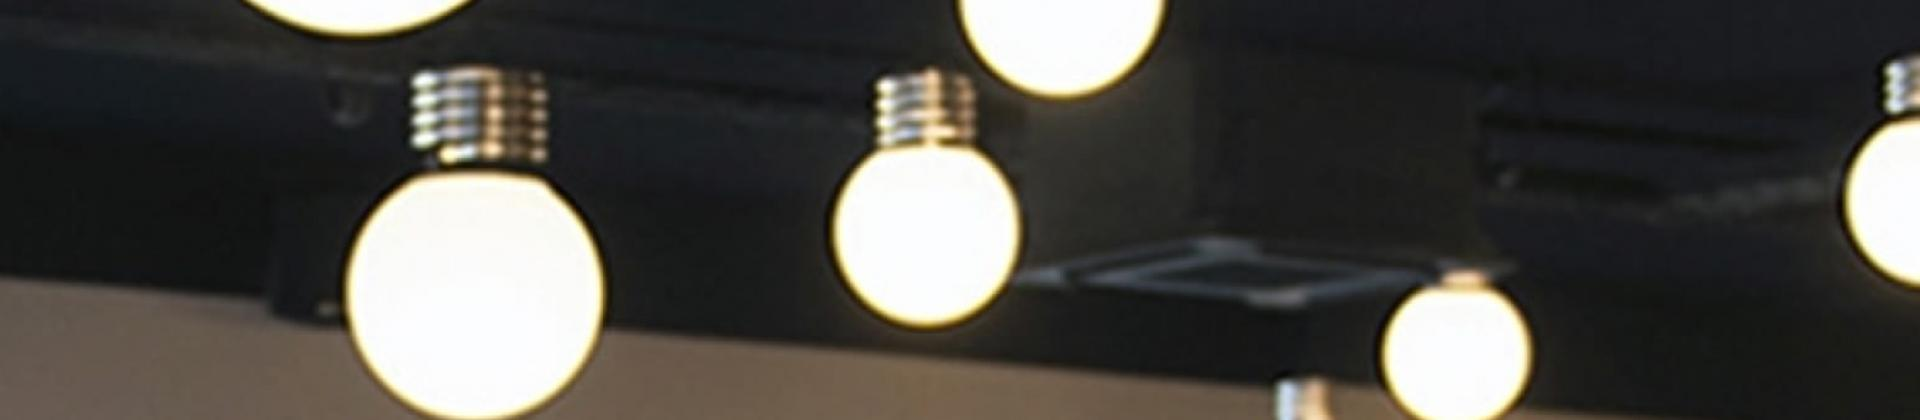 0,422 DORR - Lámparas de diseño